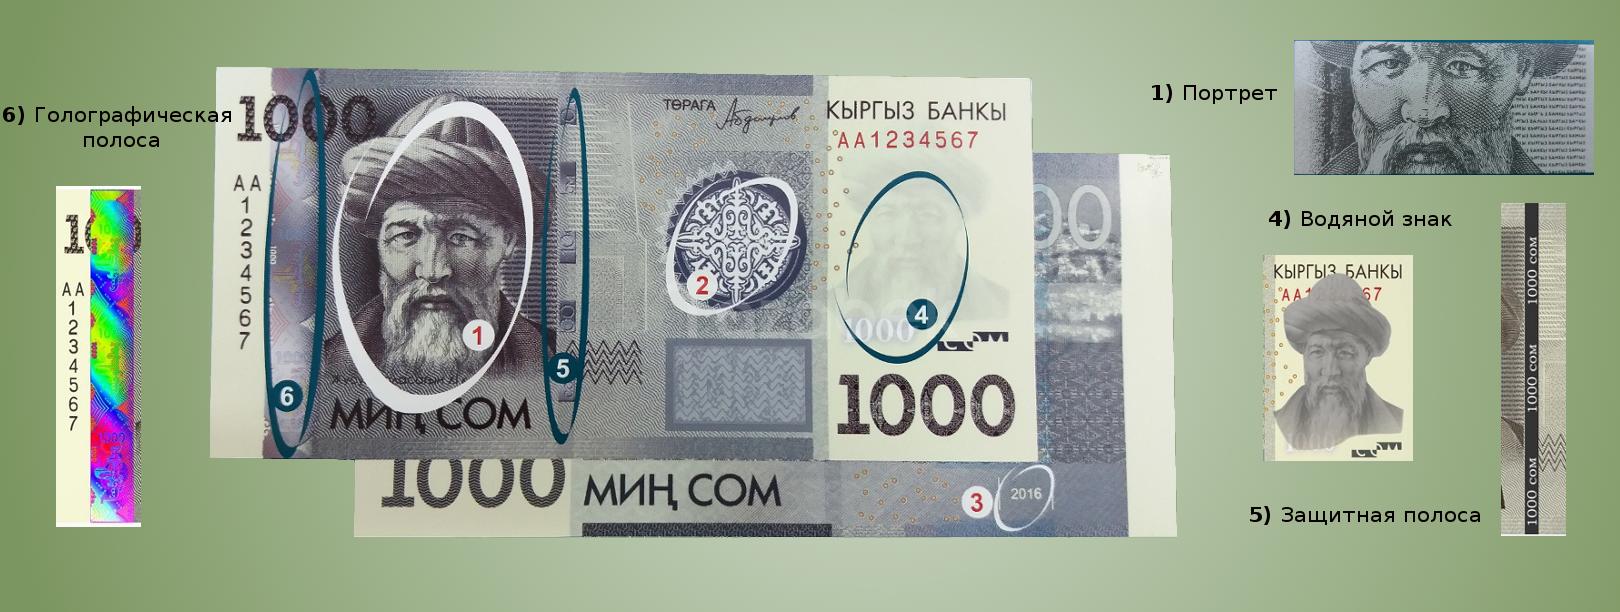 Валюта Кыргызстана - банкнота номиналом 1000 сомов образца 2017 года. АКИpress